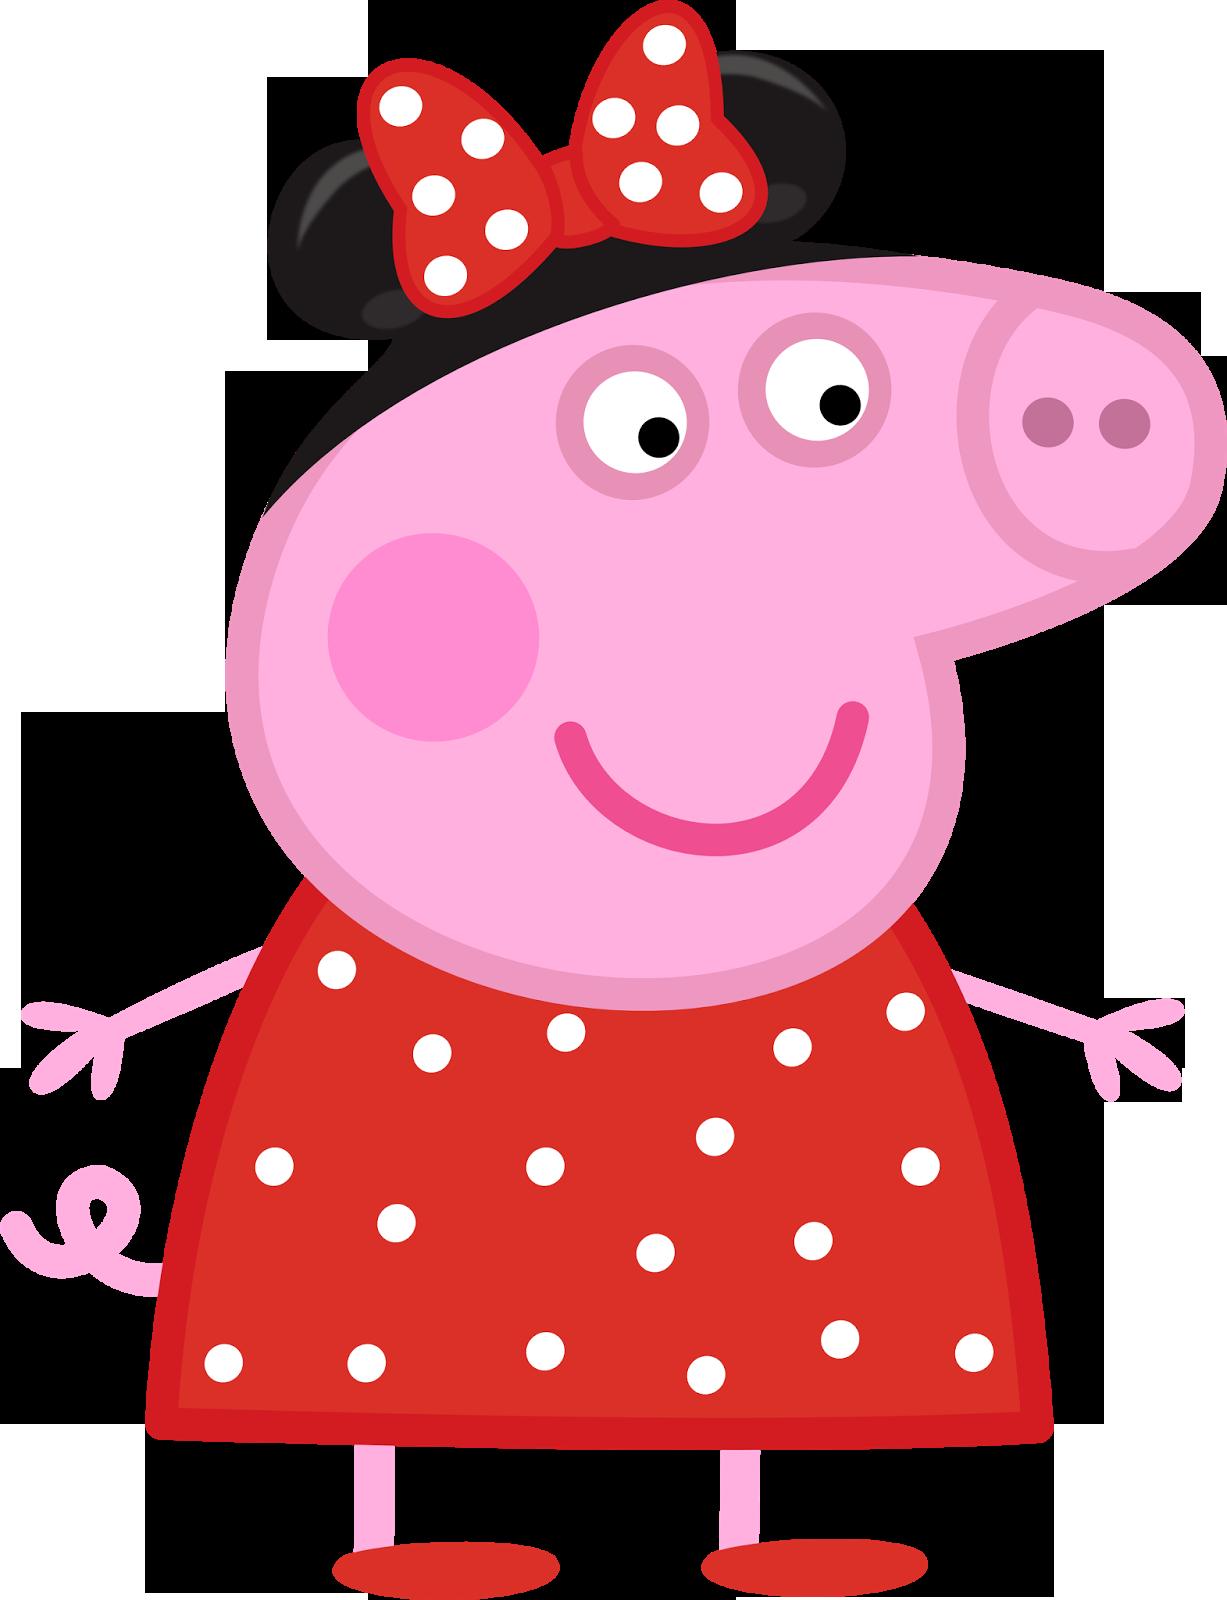 Peppa Pig PNG, peppa png piggy, Peppa Png Schweinchen, png de nuez de peppa